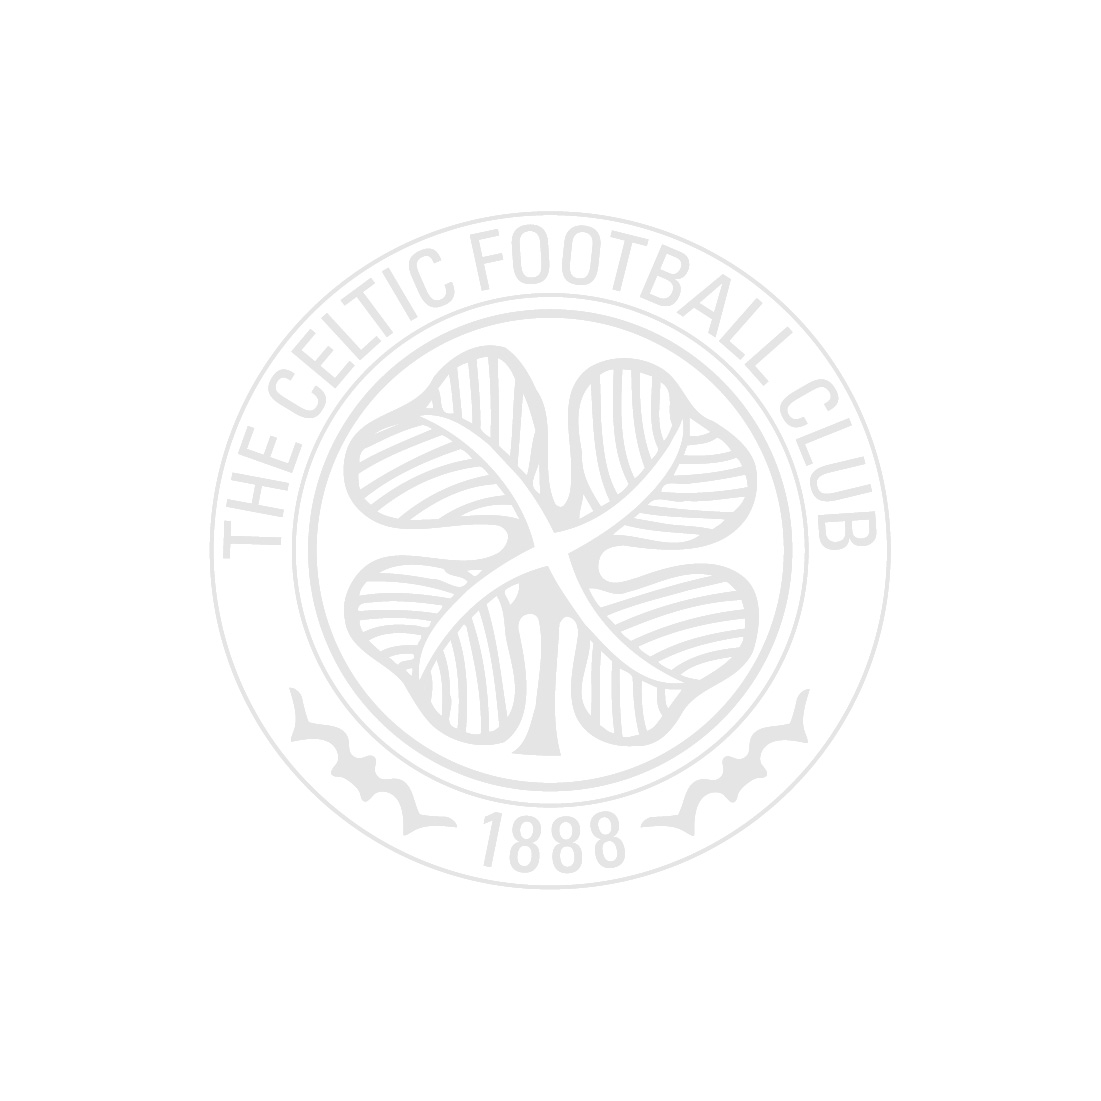 Celtic 1988 Crest Whisky Glass Set